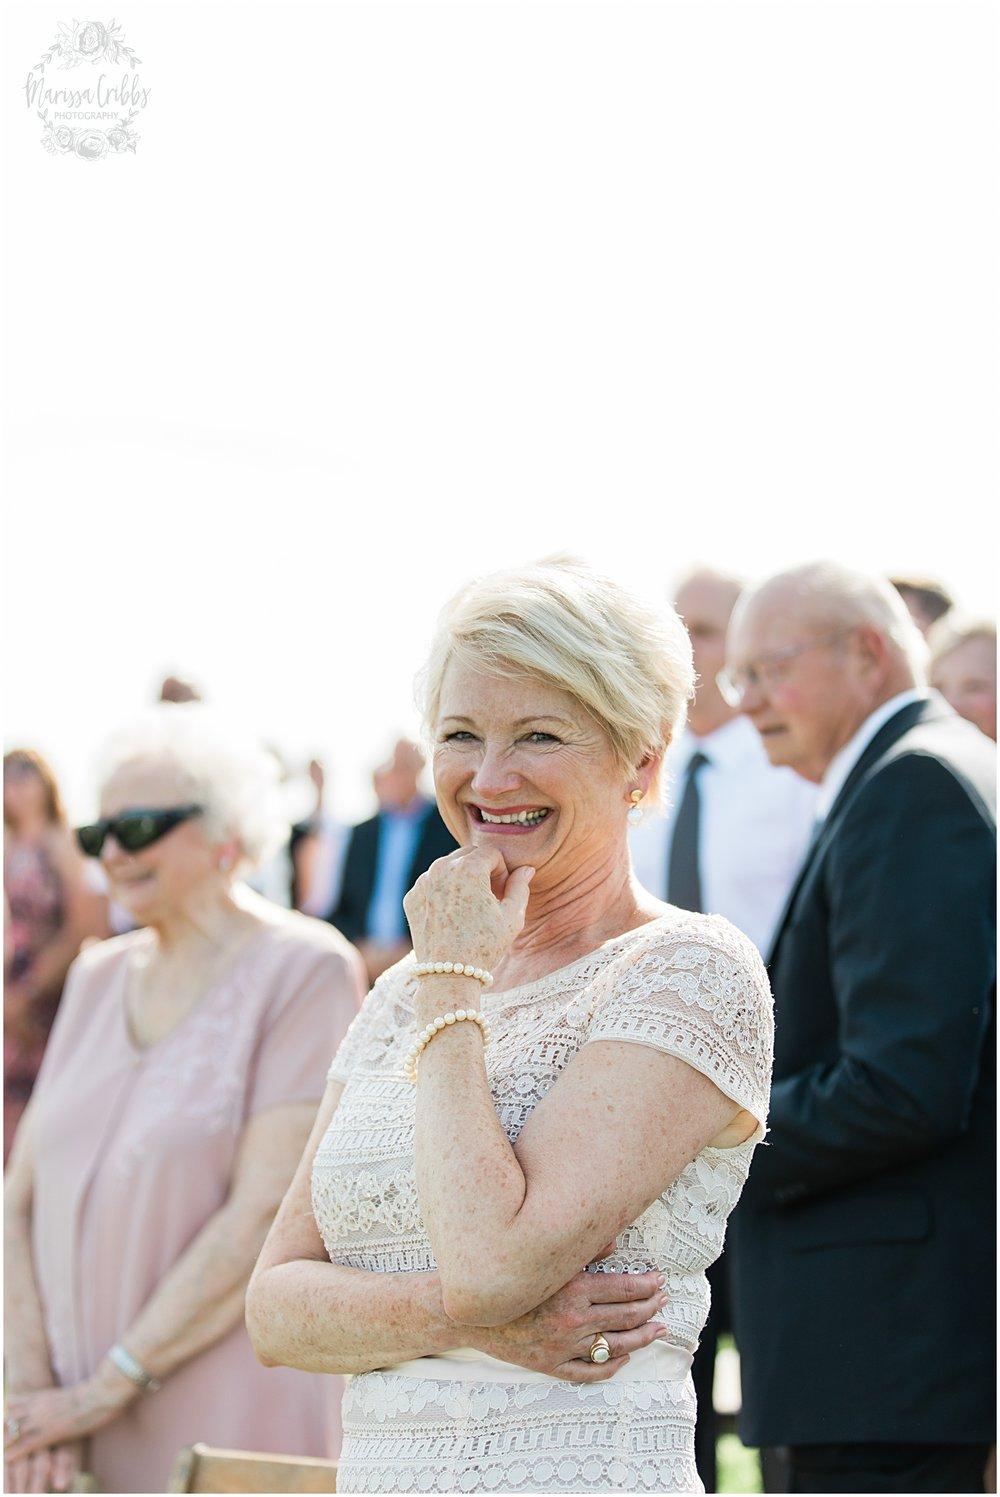 RHODES WEDDING | WESTON RED BARN FARM | MARISSA CRIBBS PHOTOGRAPHY_5273.jpg